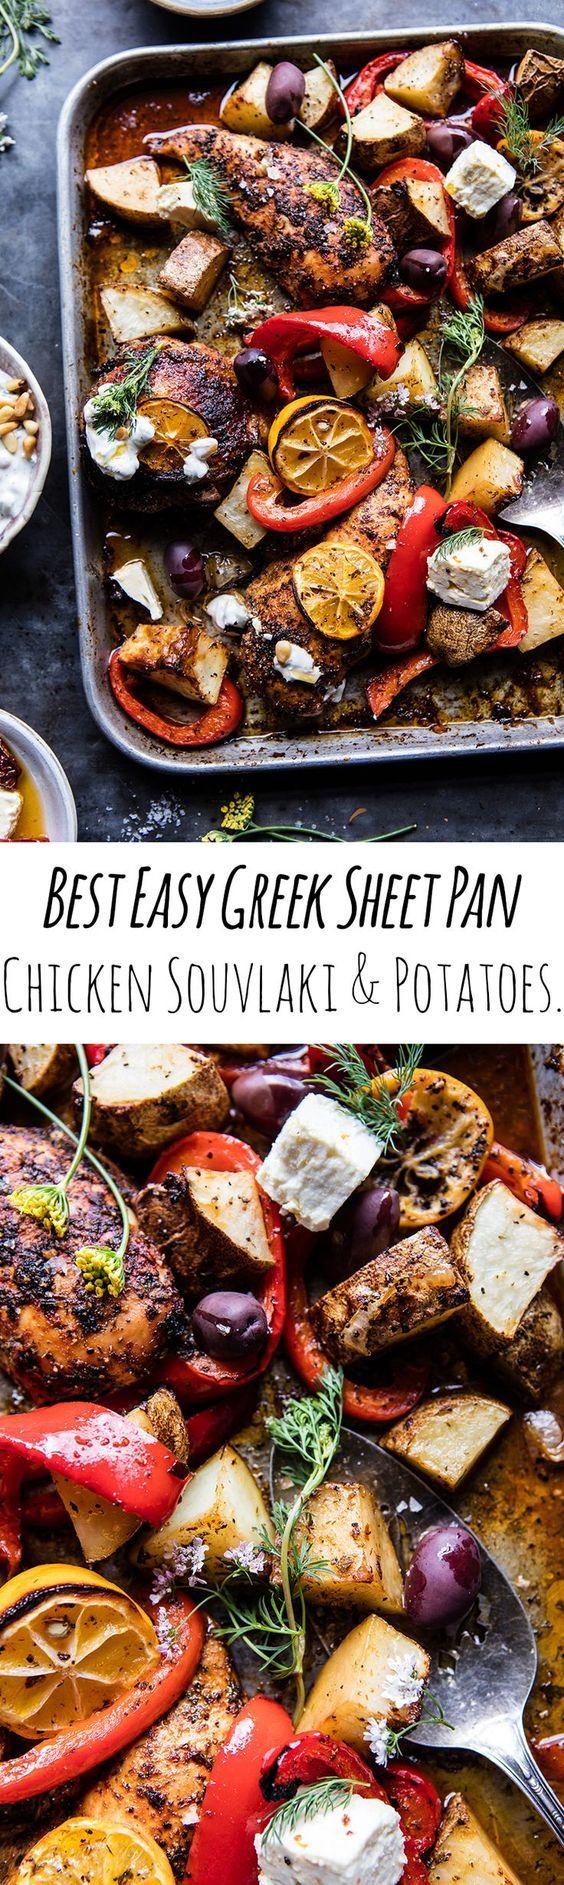 Best Easy Greek Sheet Pan Chicken Souvlaki and Potatoes | http://halfbakedharvest.com /hbharvest/